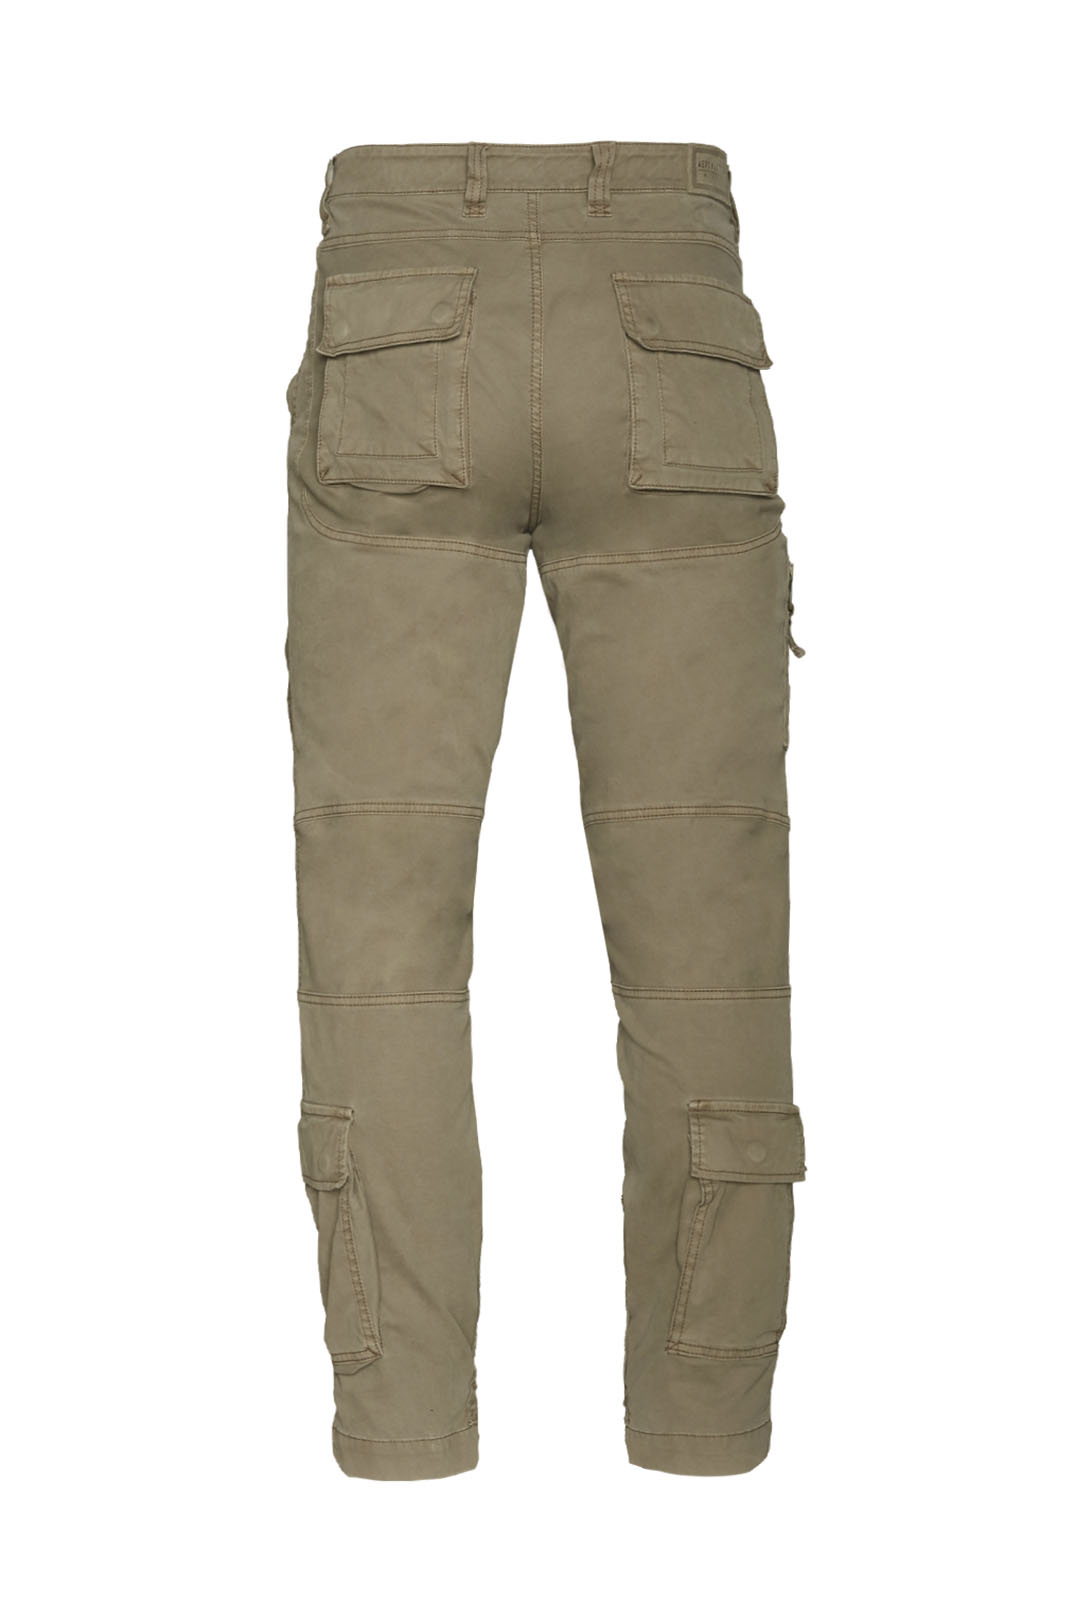 Iconic gabardine Anti-G trousers         2